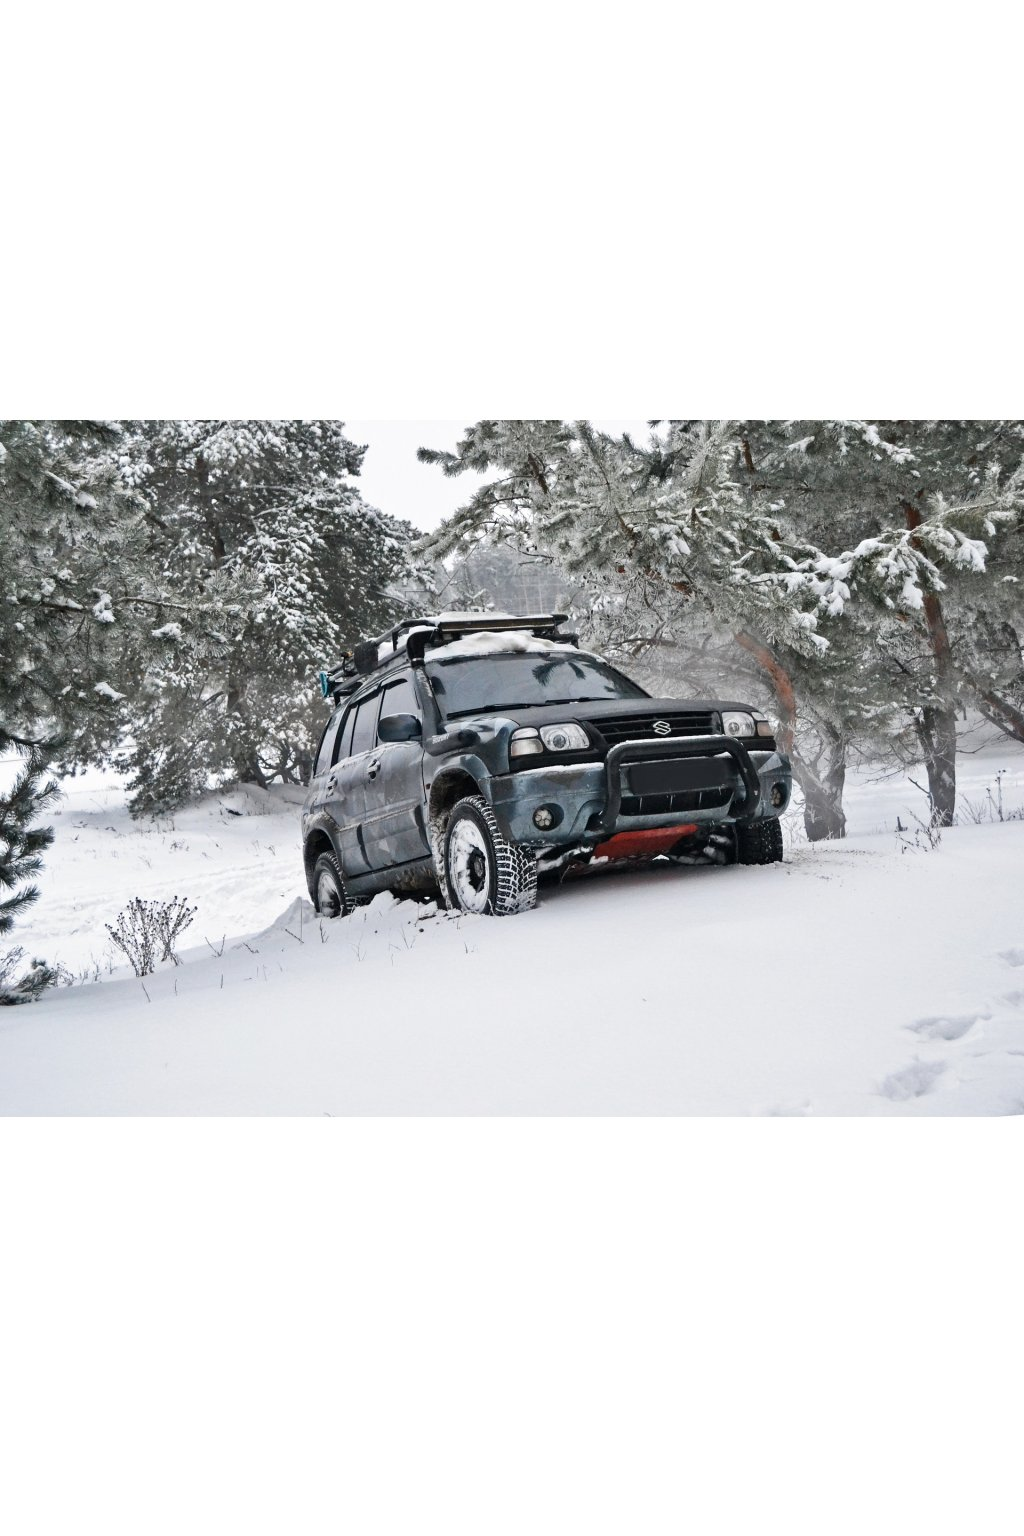 Kurz jizdy na snehu driving academy skola smyku zimni obdobi